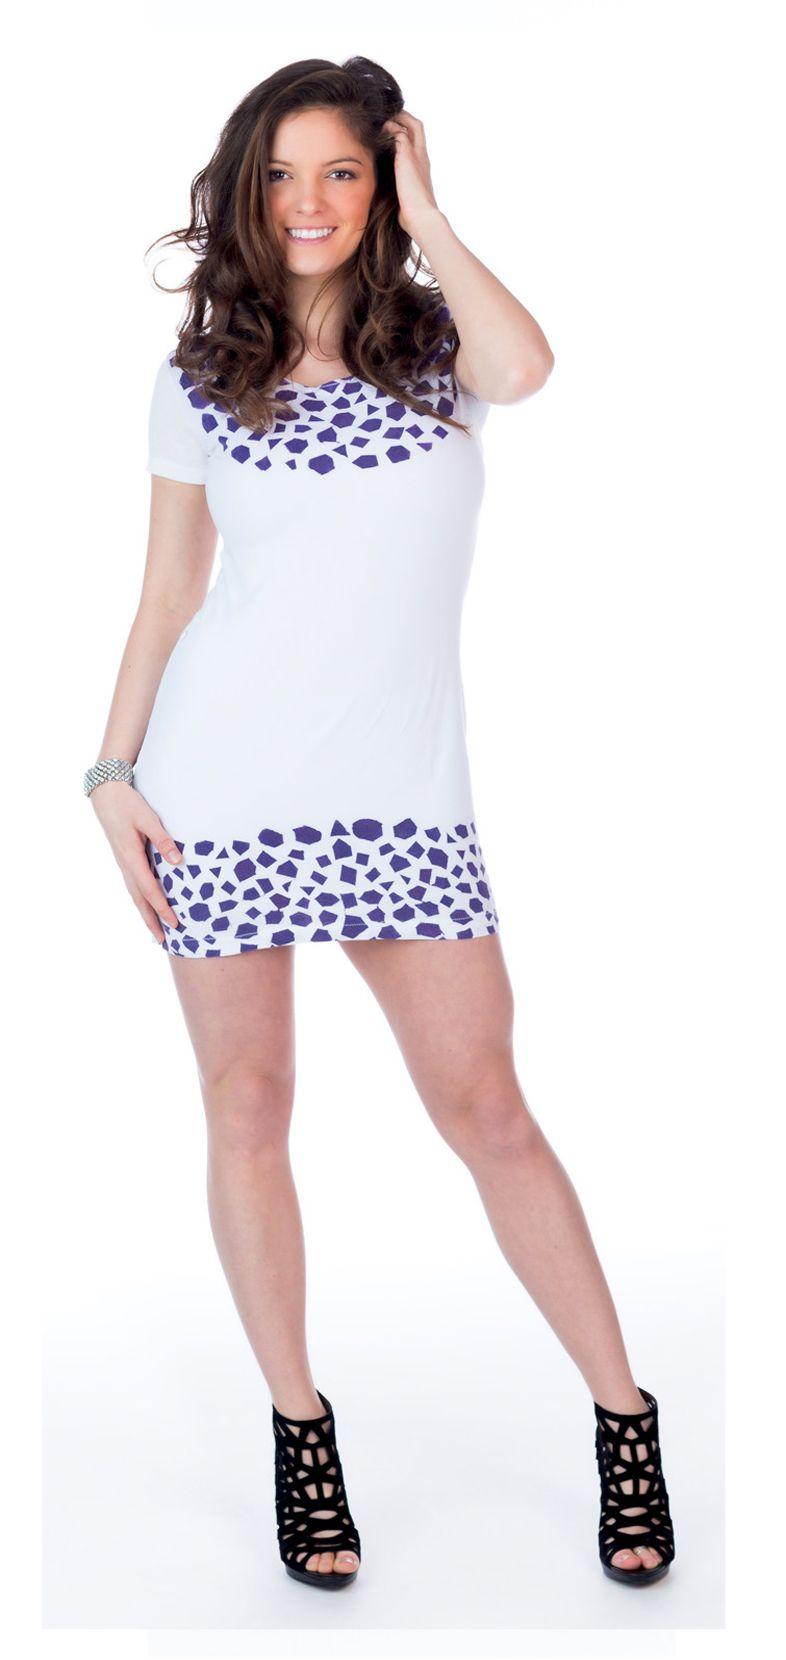 Sandstone Print Sheath Short Dress  prints  designer  fashion  clothing  women s  wear 27d593935e